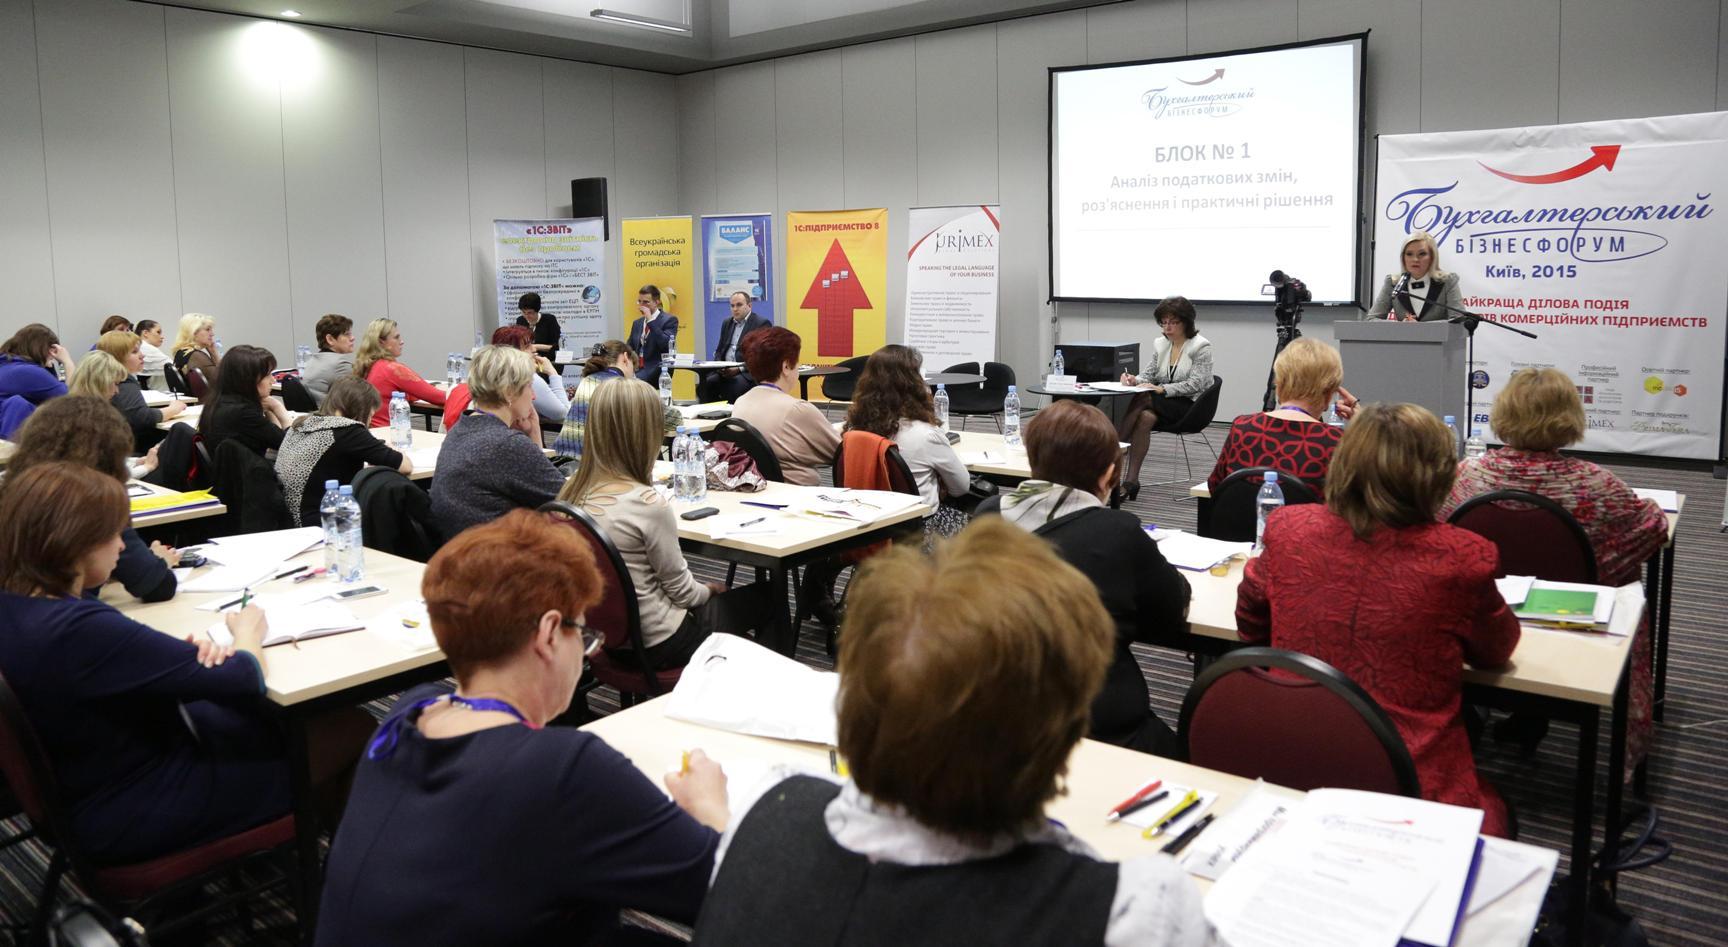 Бухгалтерский бизнес-форум